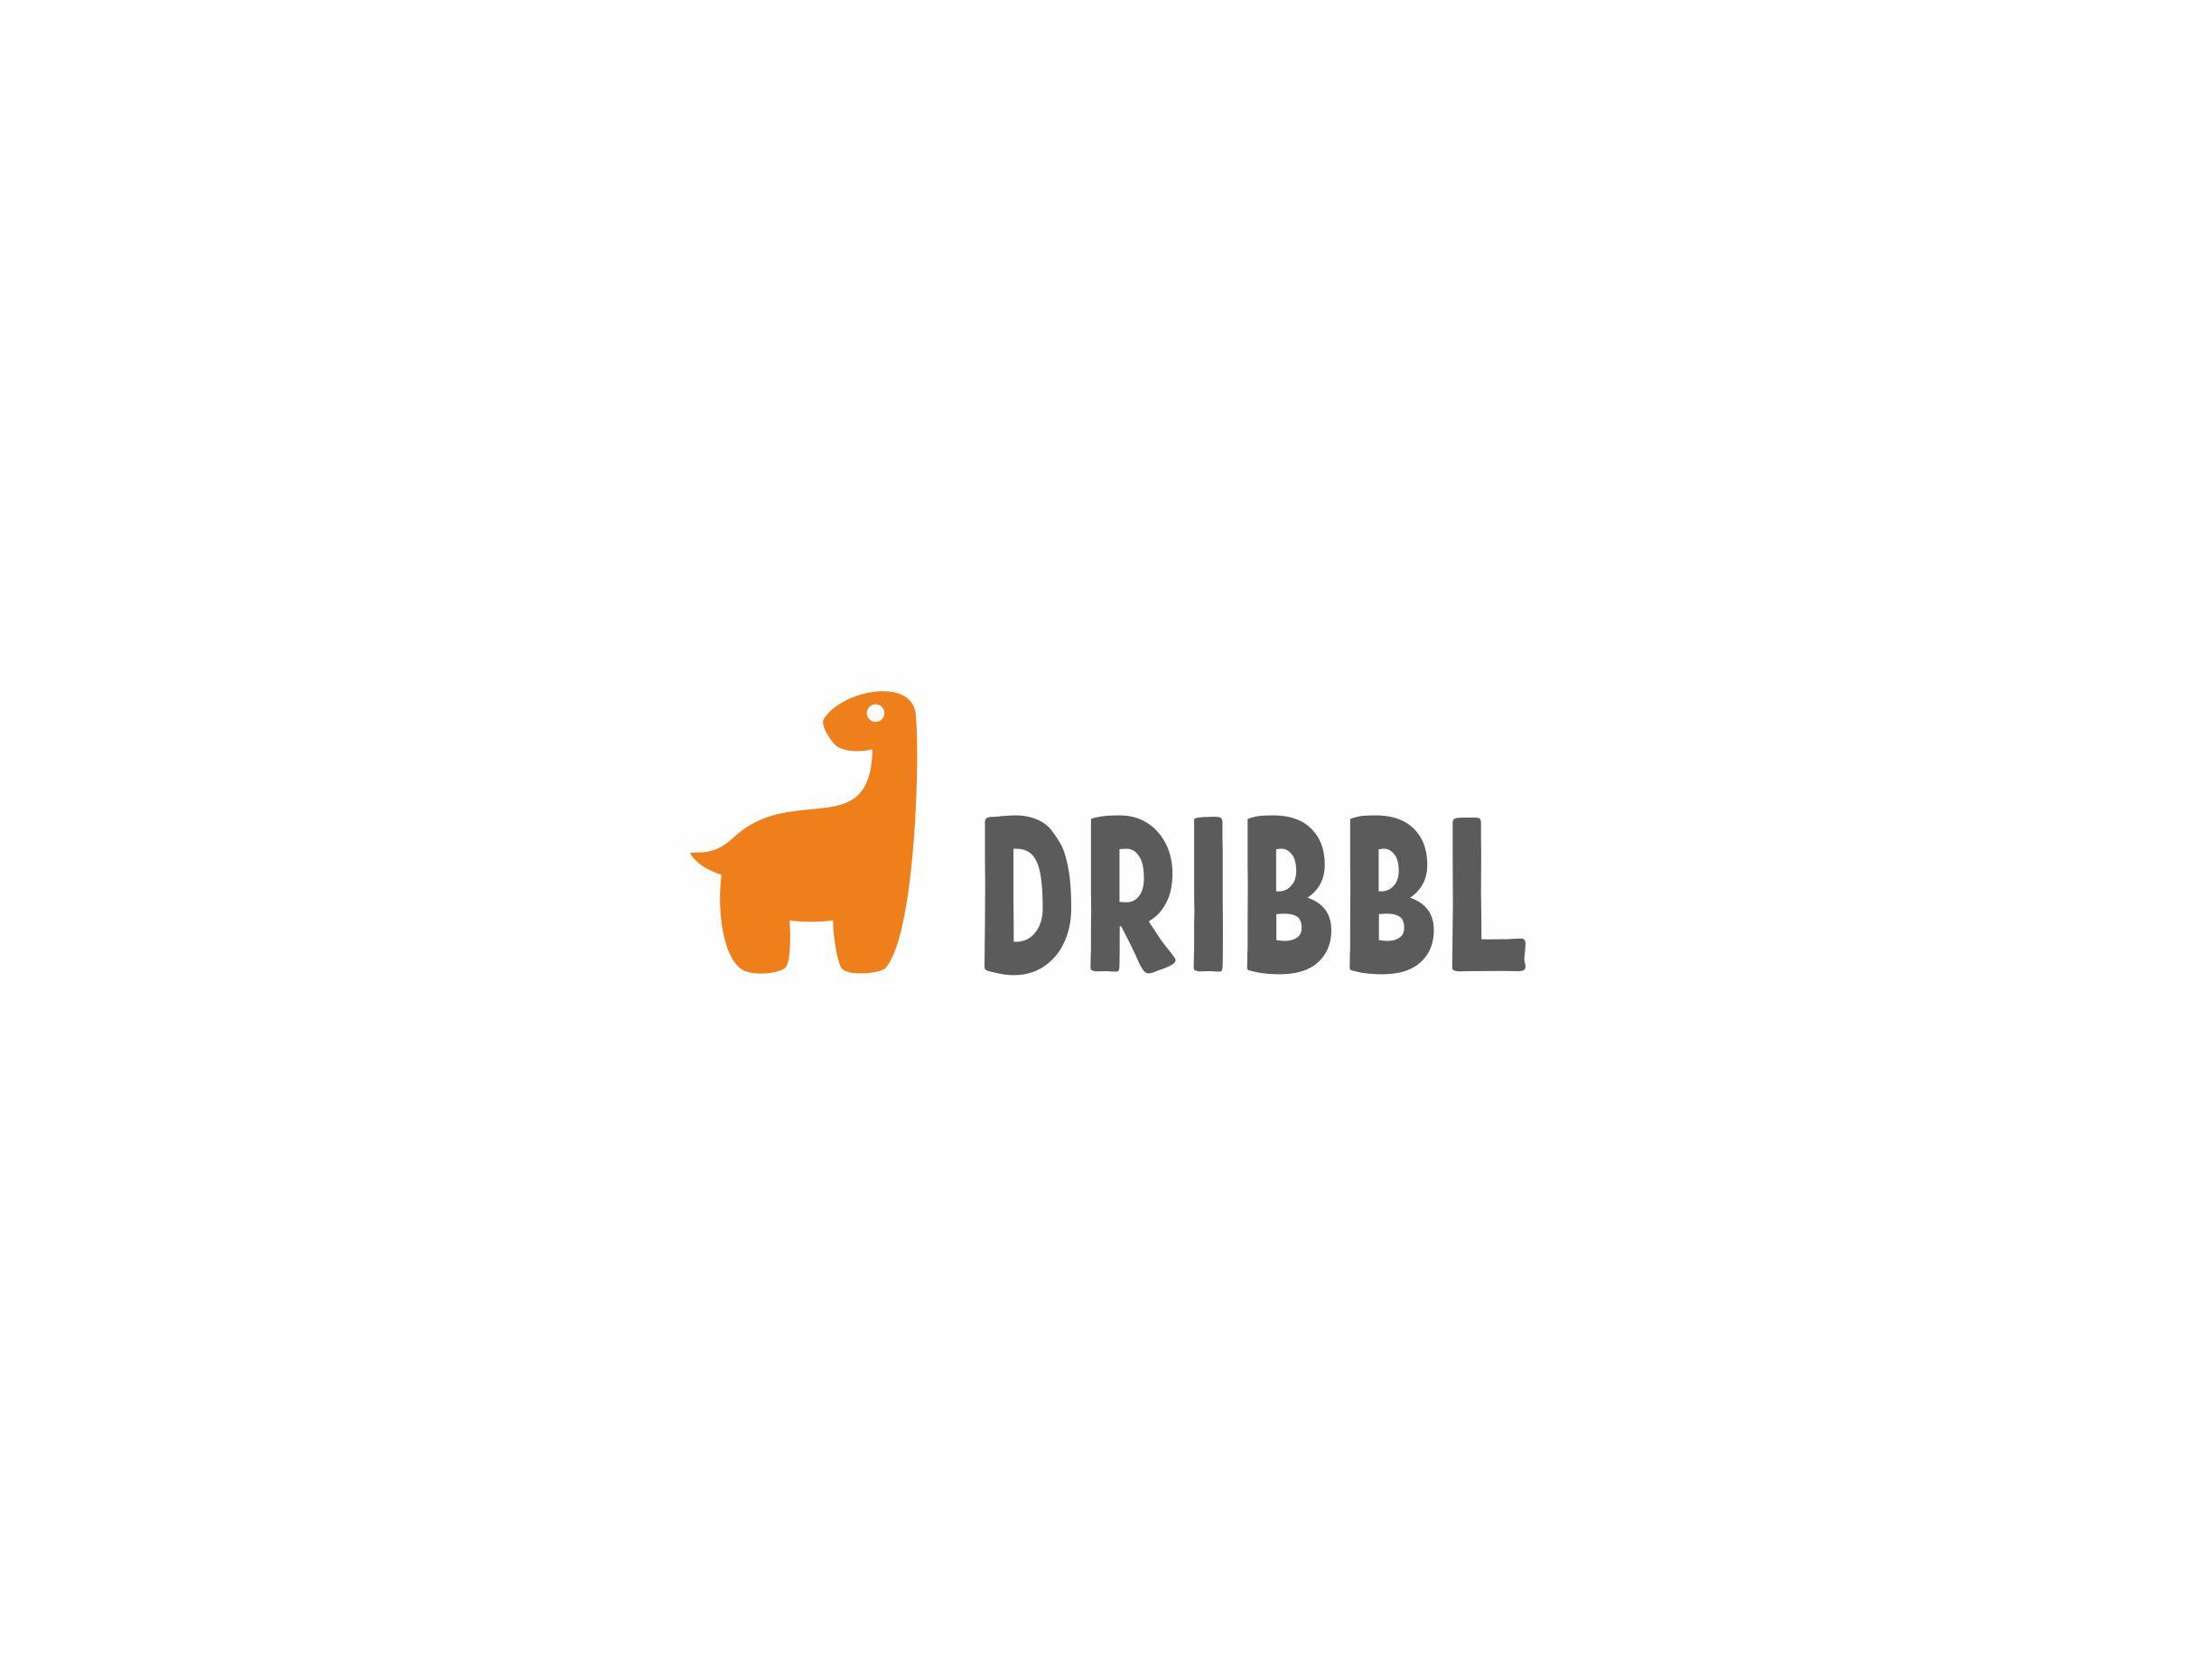 Разработка логотипа для сайта Dribbl.ru фото f_4315aa028be94c2d.jpg